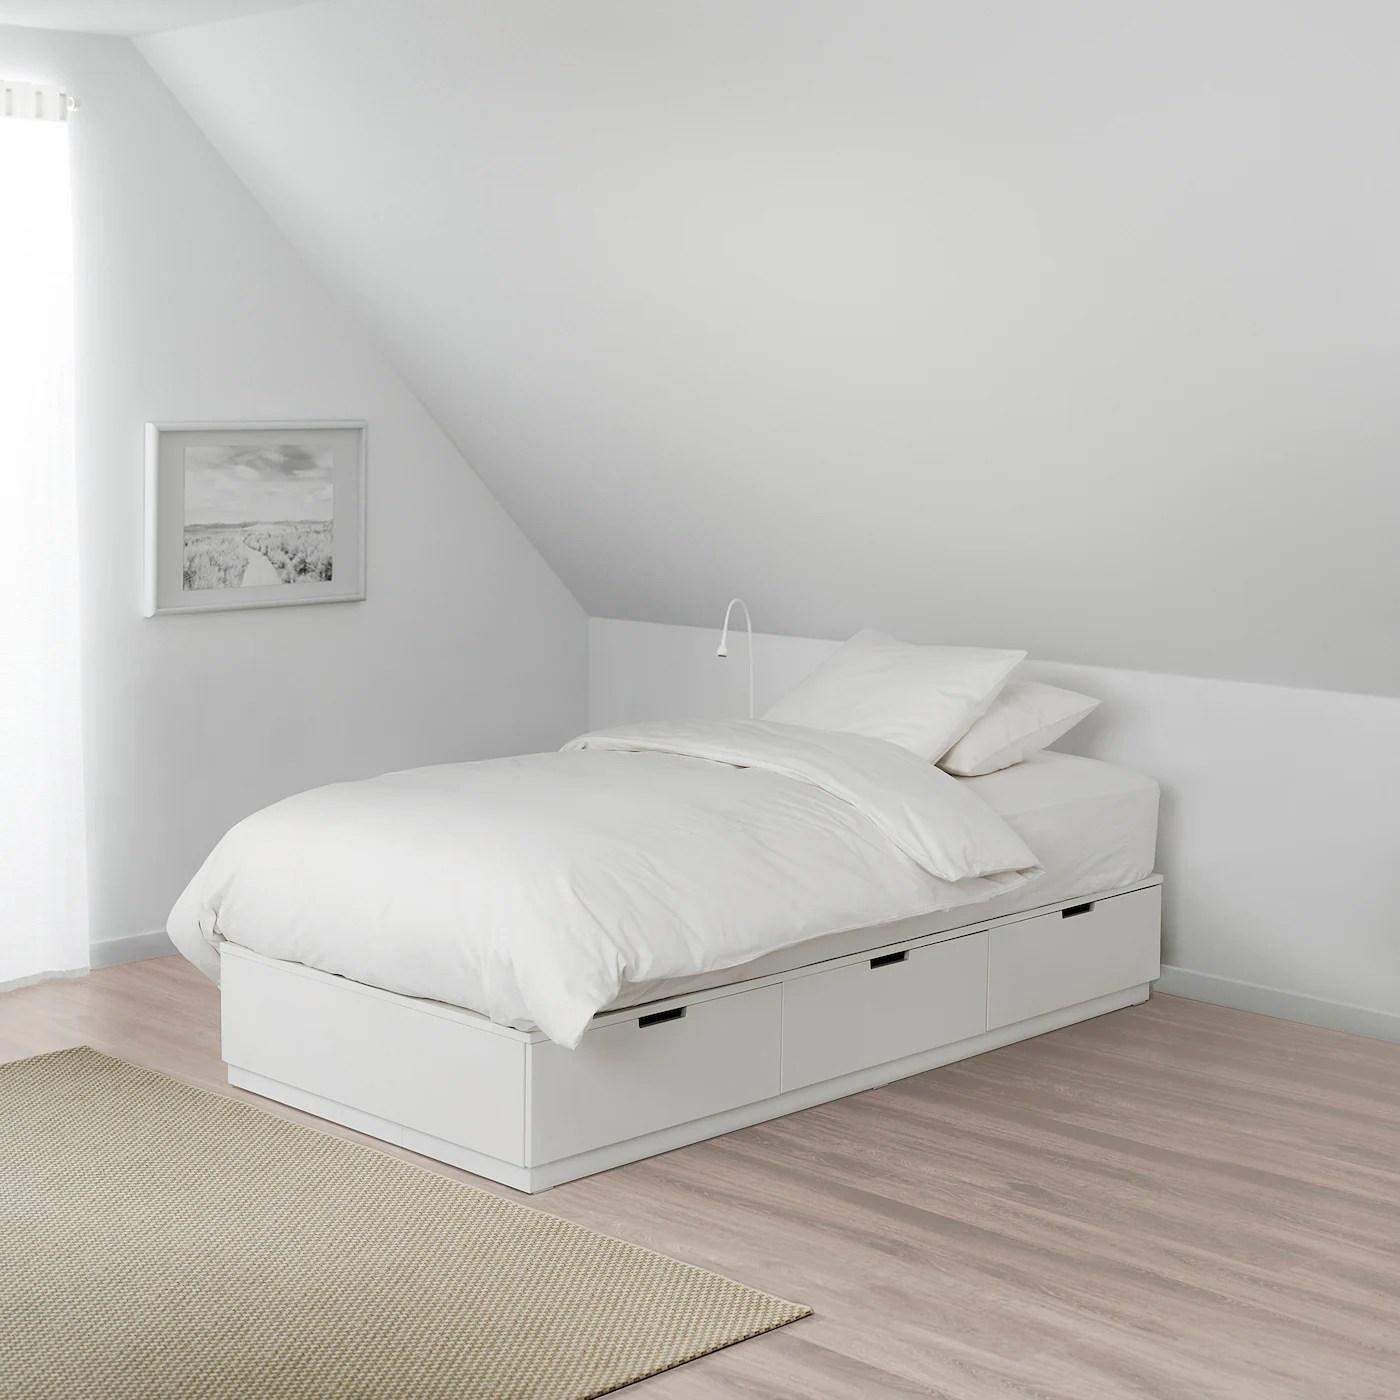 Nordli Bed Frame With Storage White 120x200 Cm Ikea